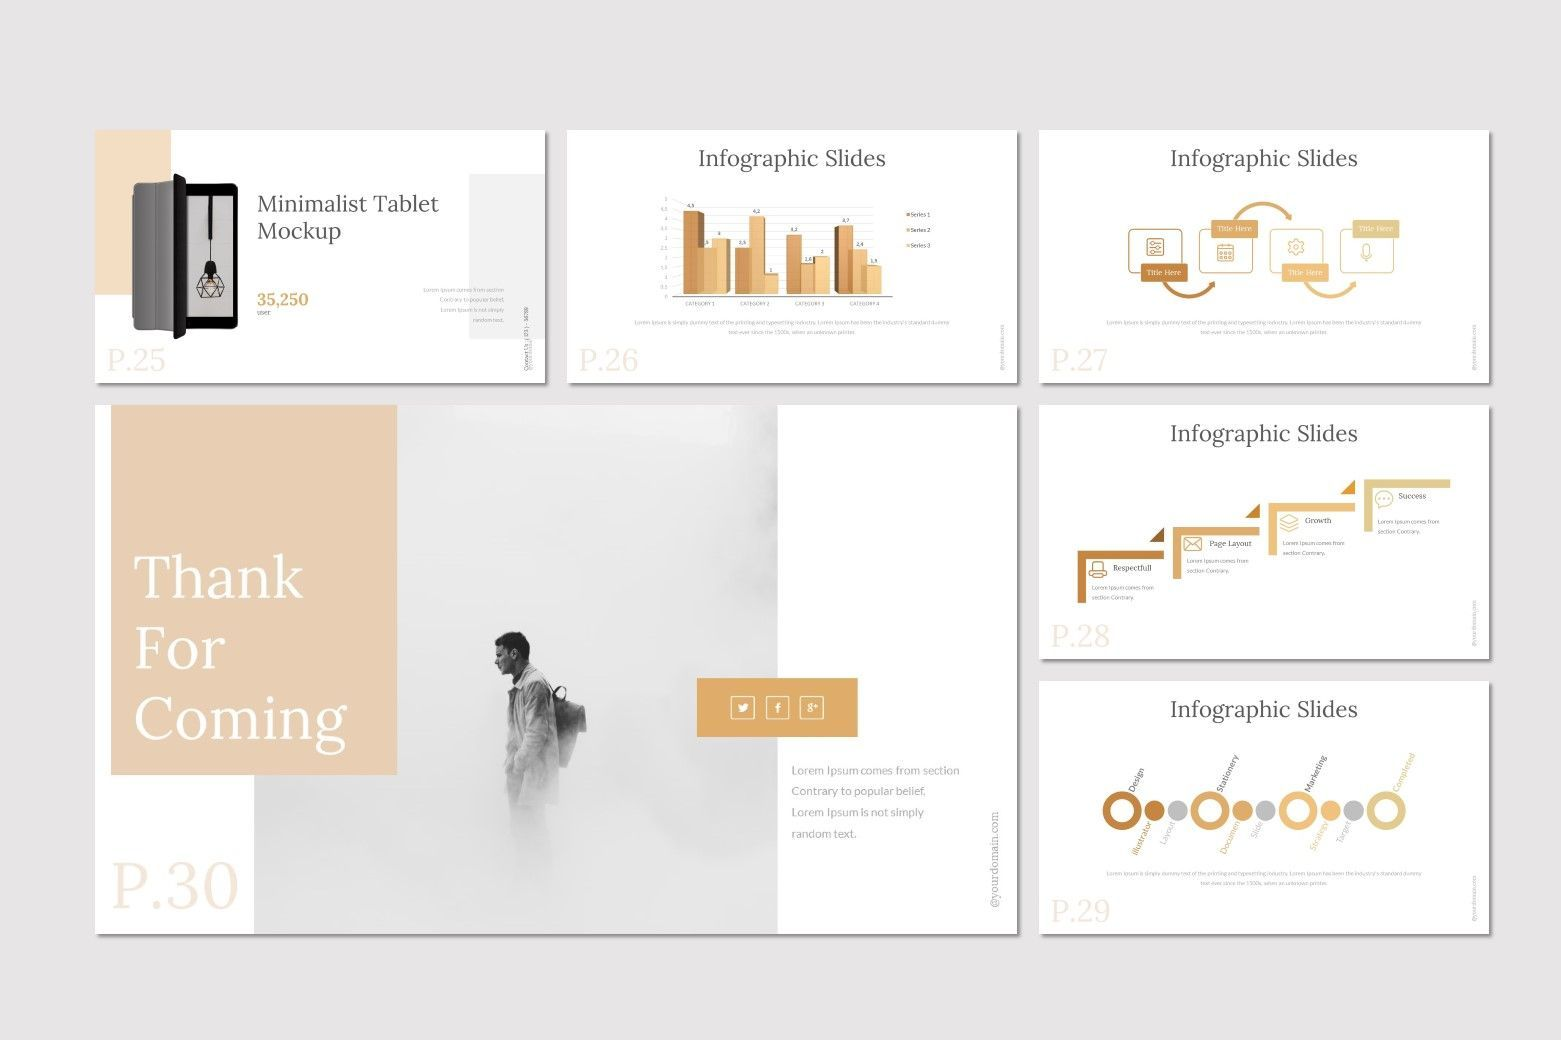 Acax - Google Slides Template, Slide 5, 07694, Presentation Templates — PoweredTemplate.com